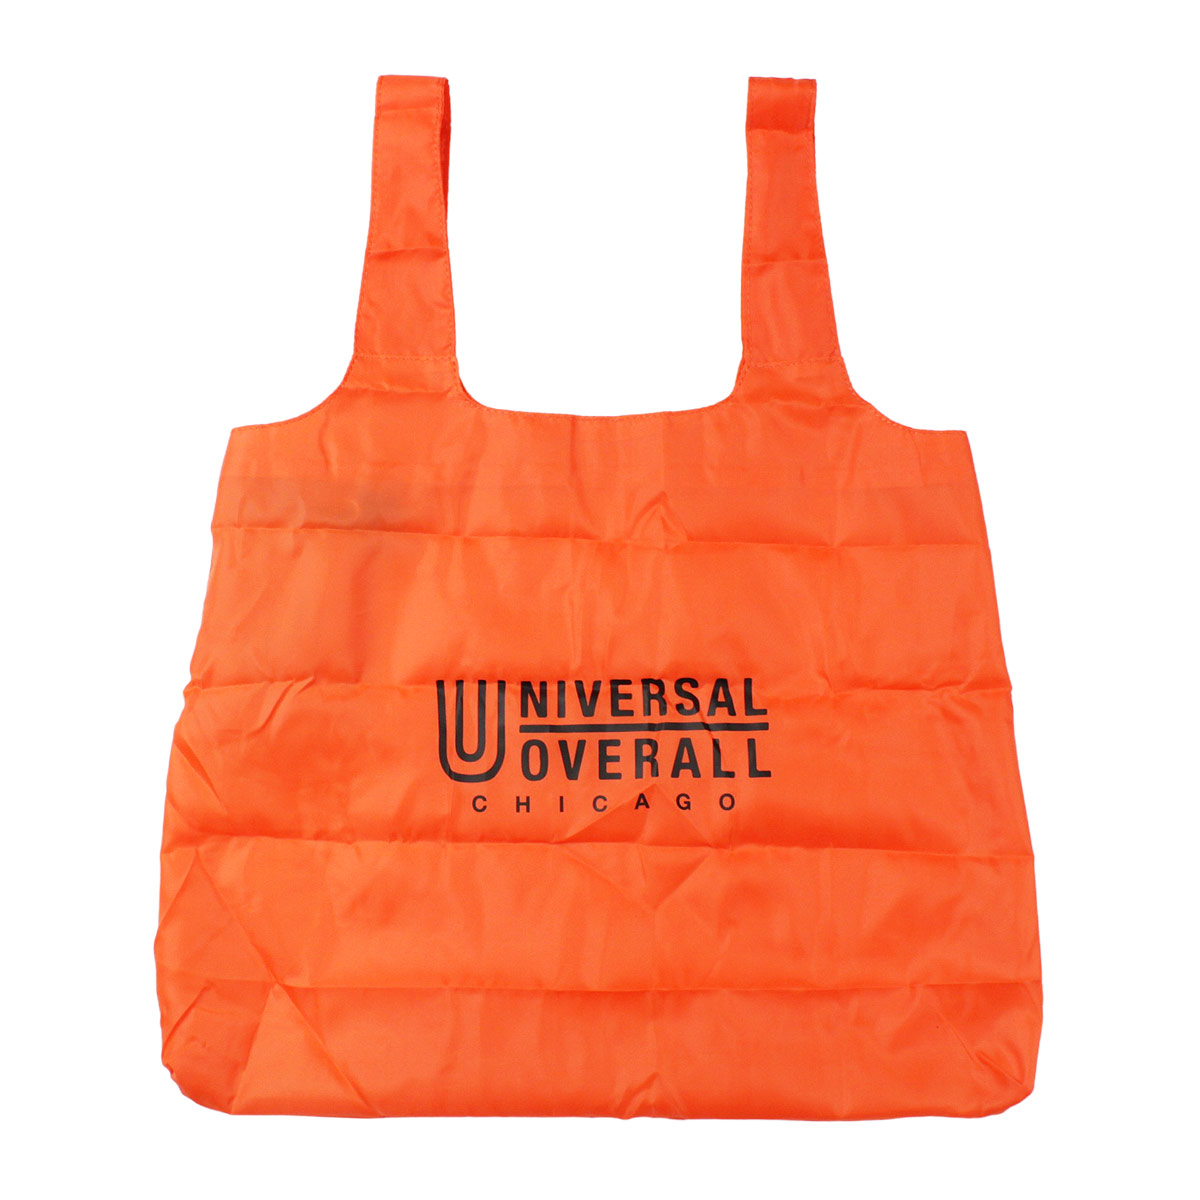 UNIVERSAL OVERALL ユニバーサルオーバーオール カラビナ付きエコバッグ